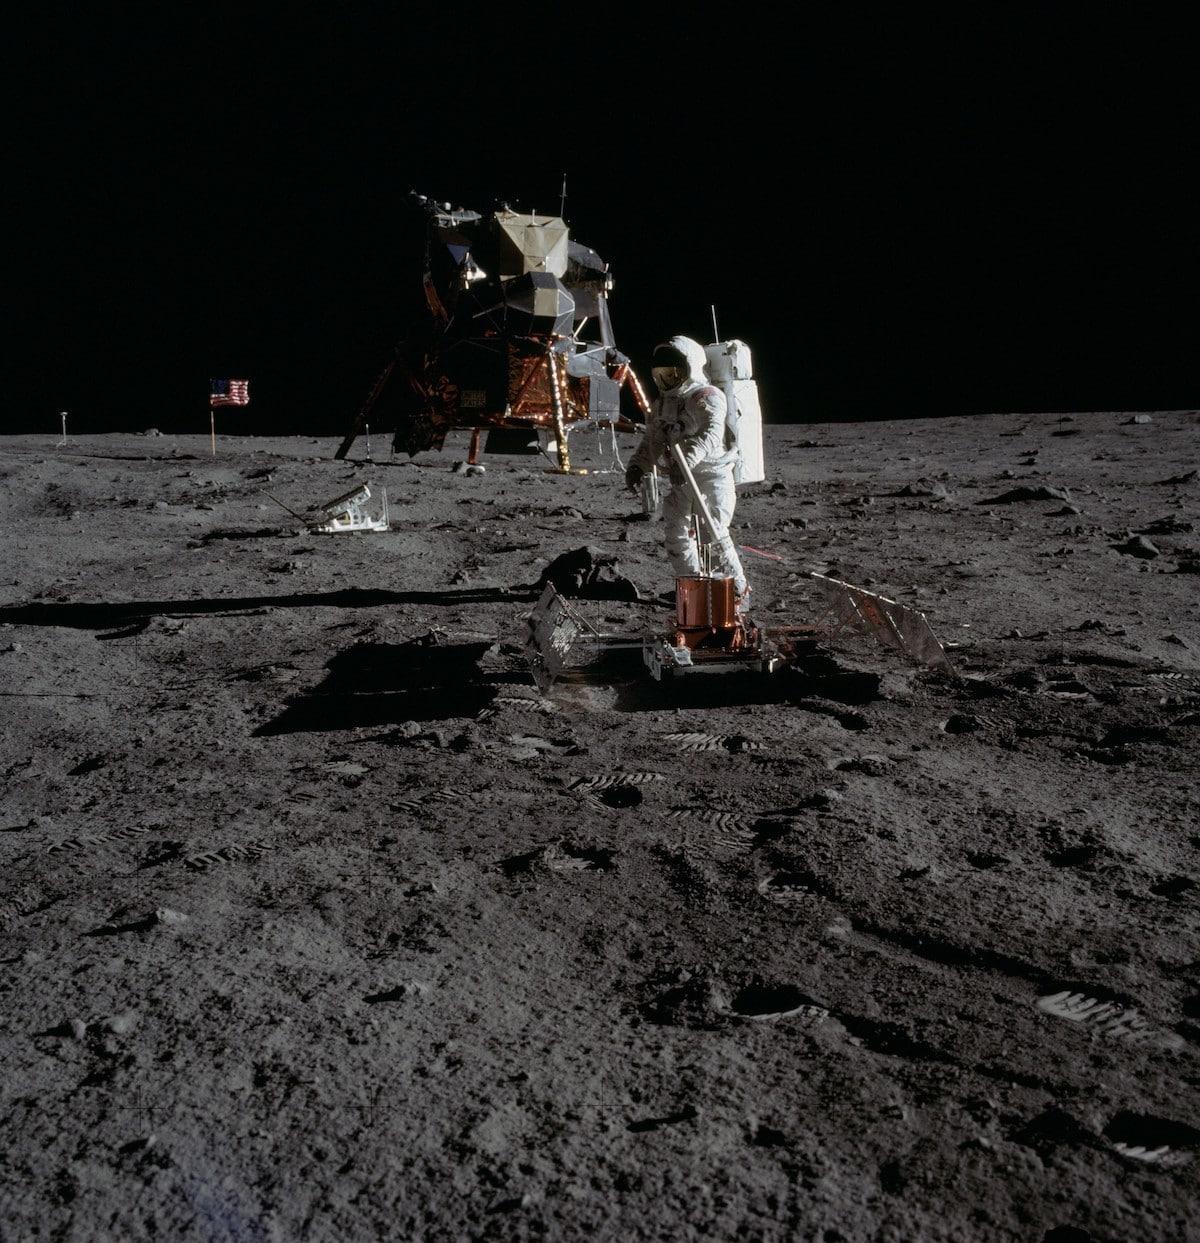 Anniversary of the Apollo 11 Moon Landing